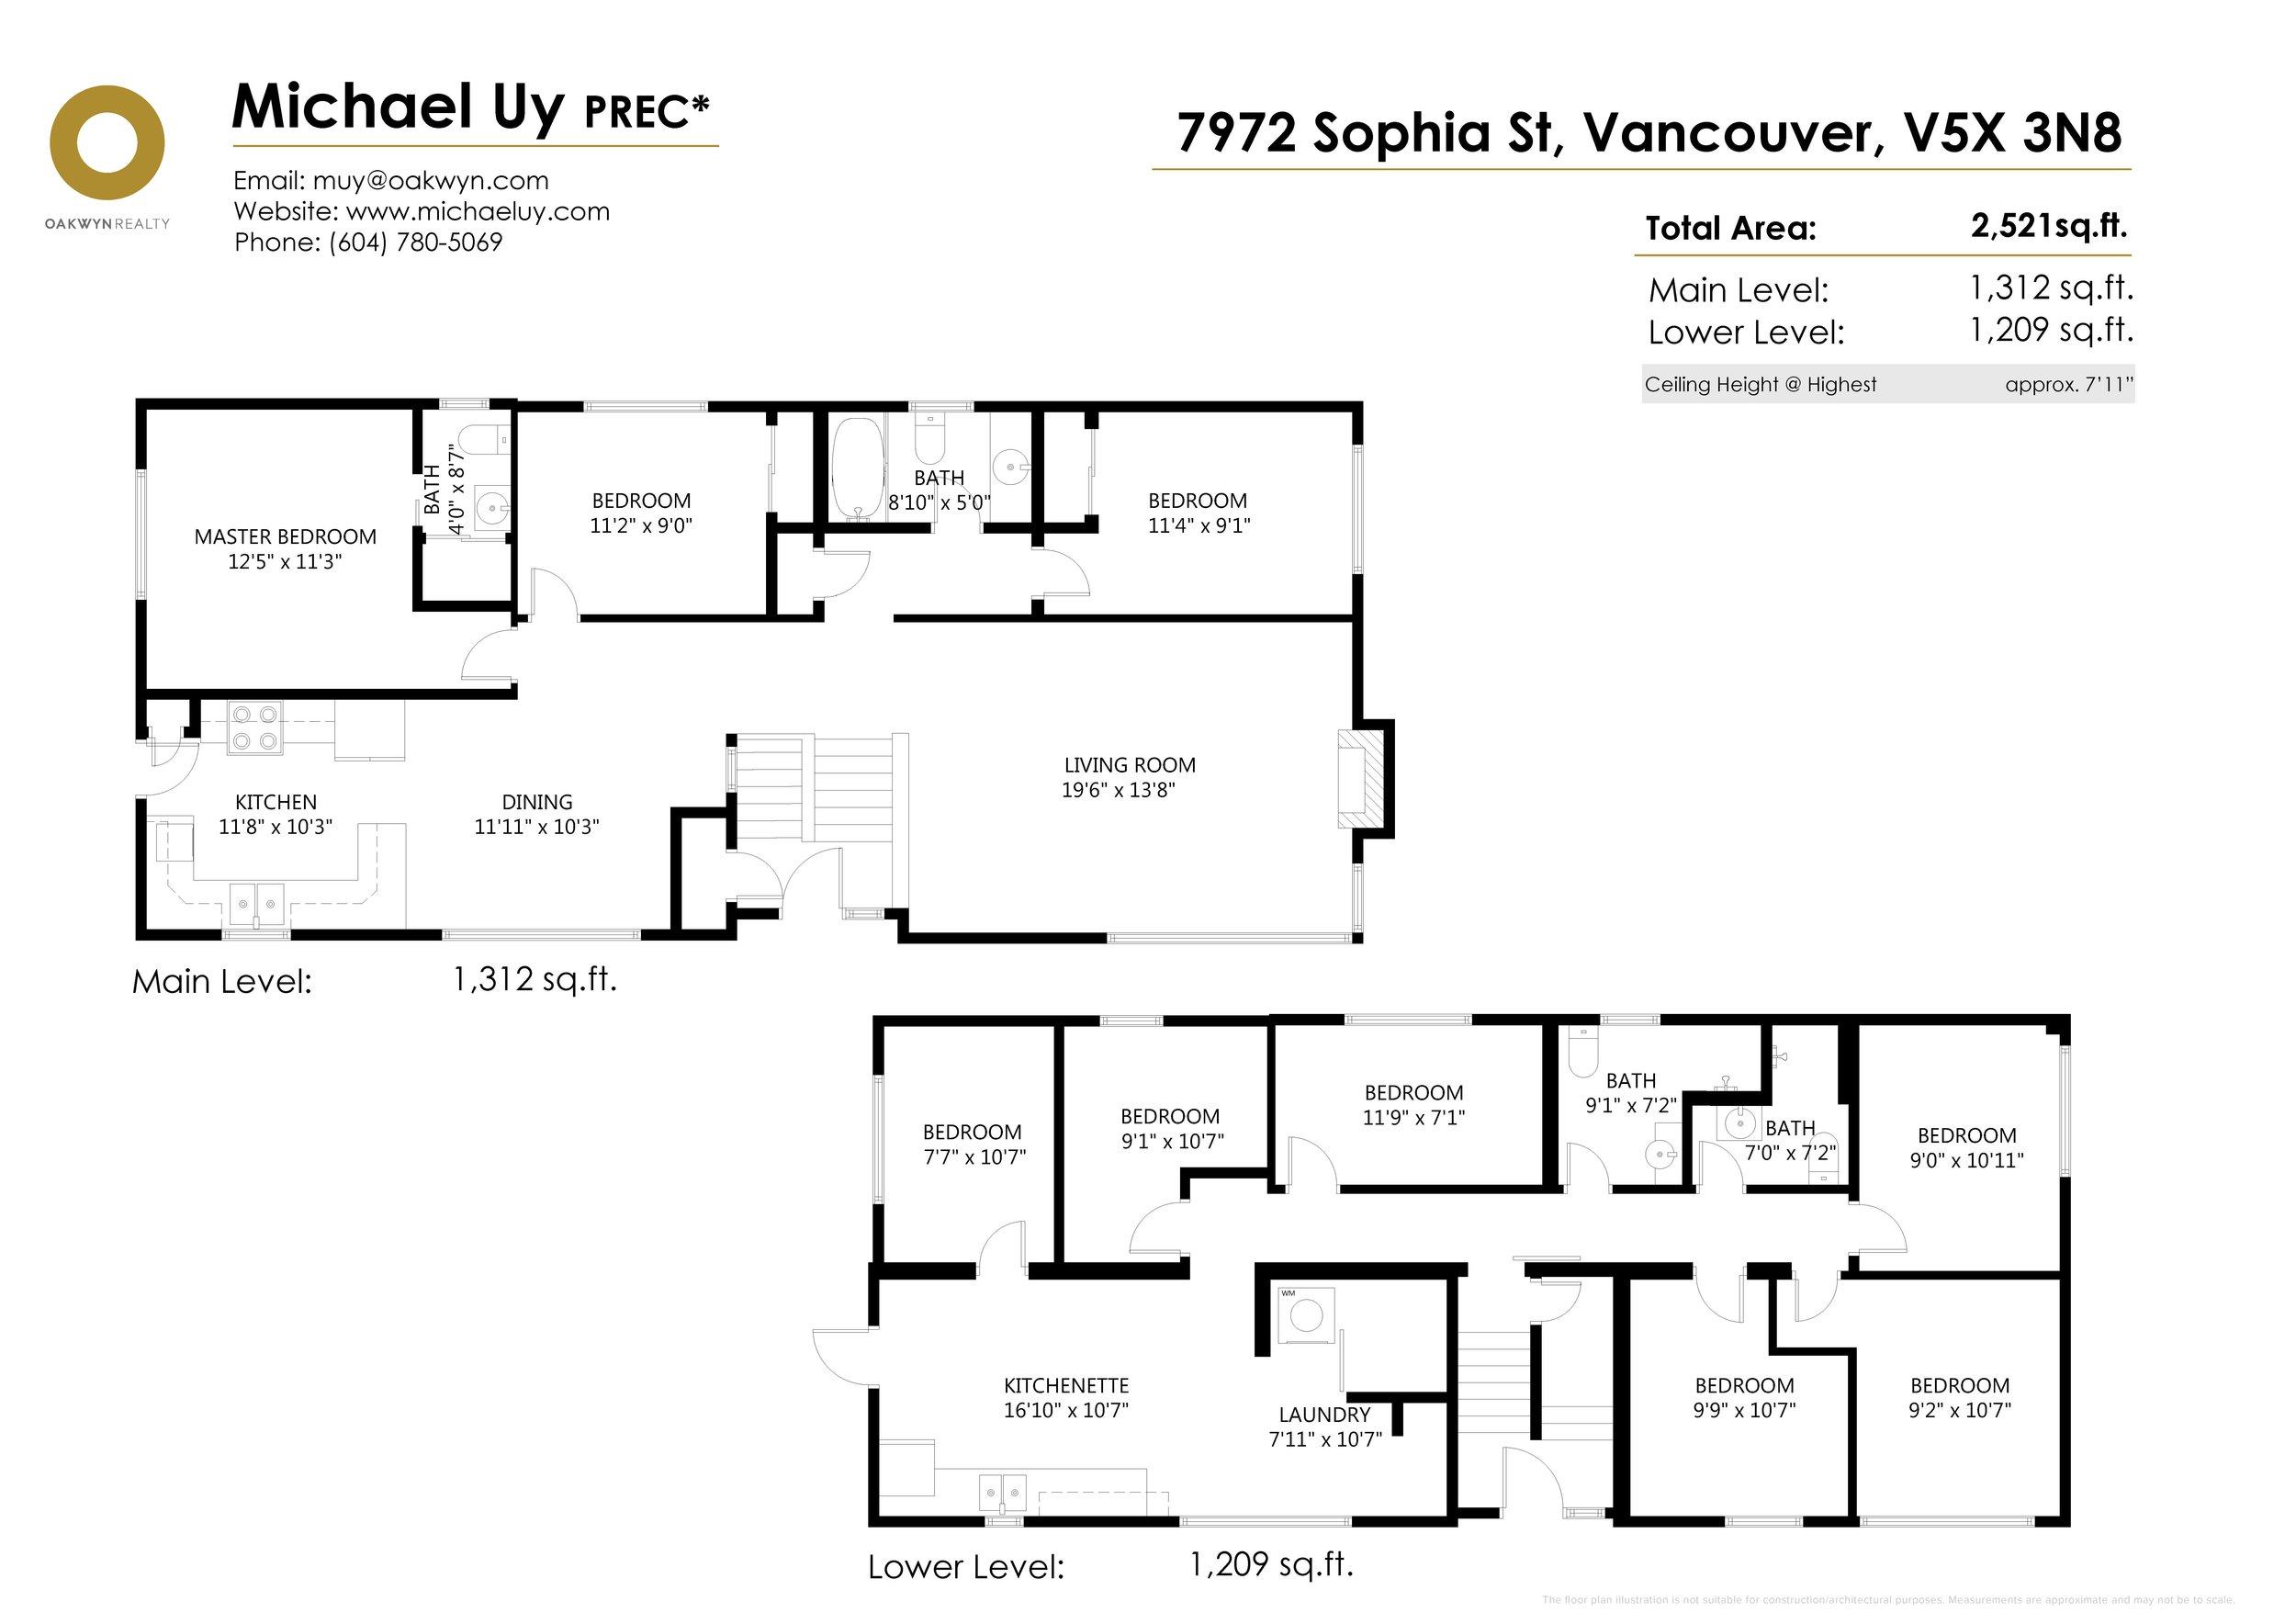 7972 Sophia St - Branded Floor Plan.jpg